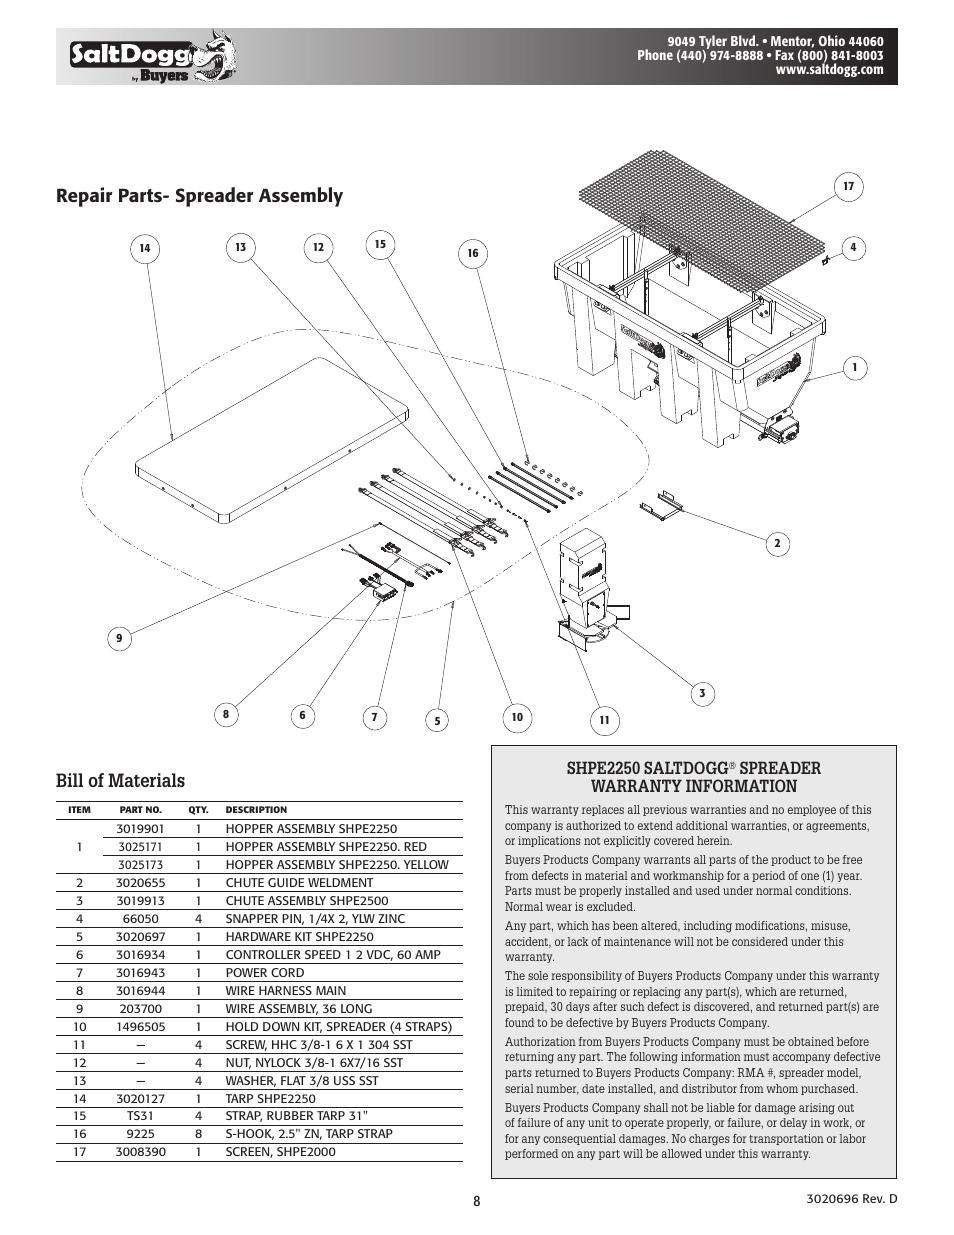 western 1000 salt spreader wiring diagram trane xr13 air conditioner harness | library